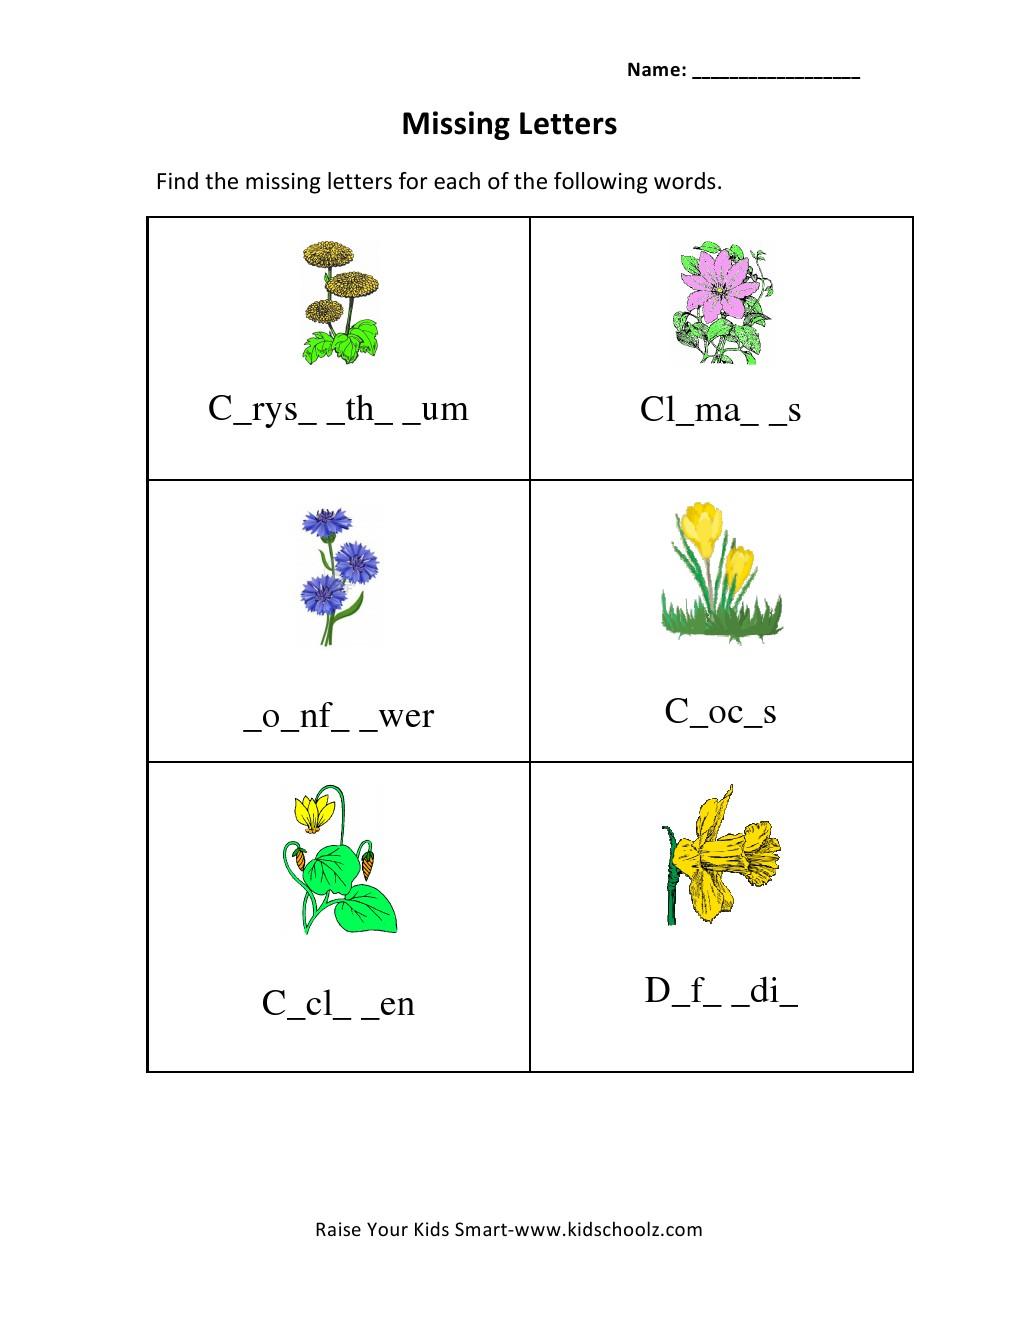 Grade 3 Missing Letters Worksheet